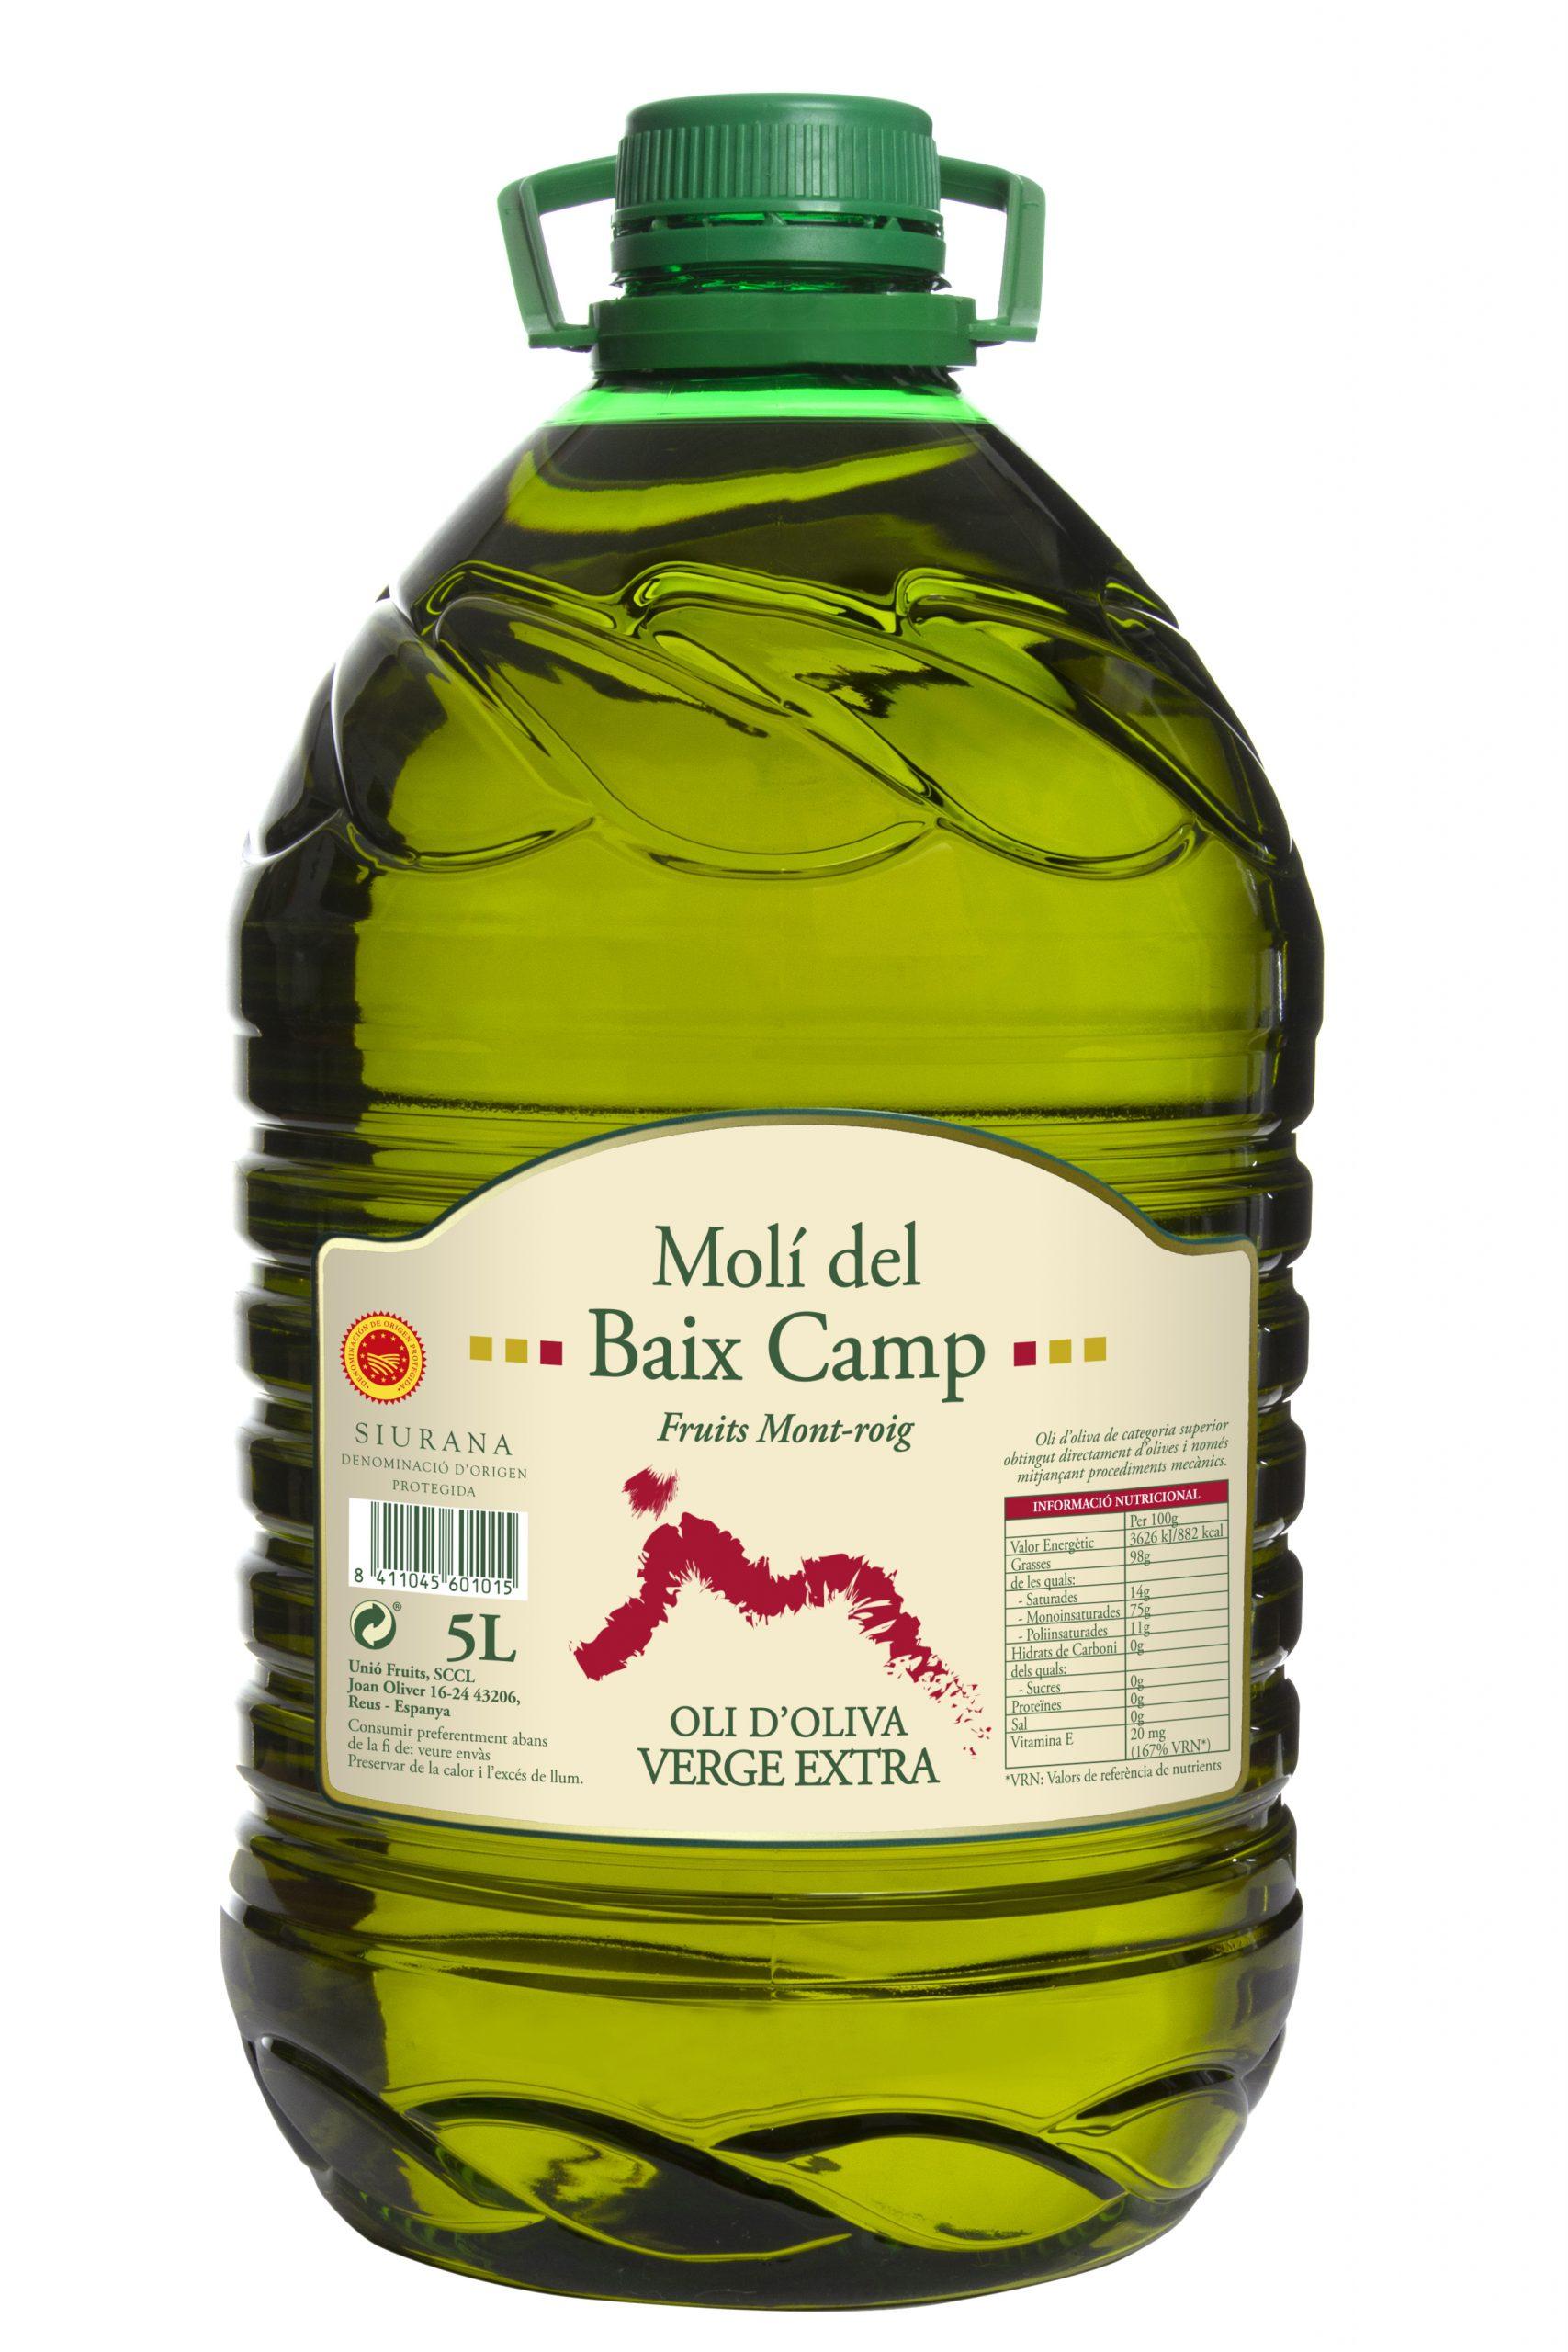 Moli Bx Camp 5L